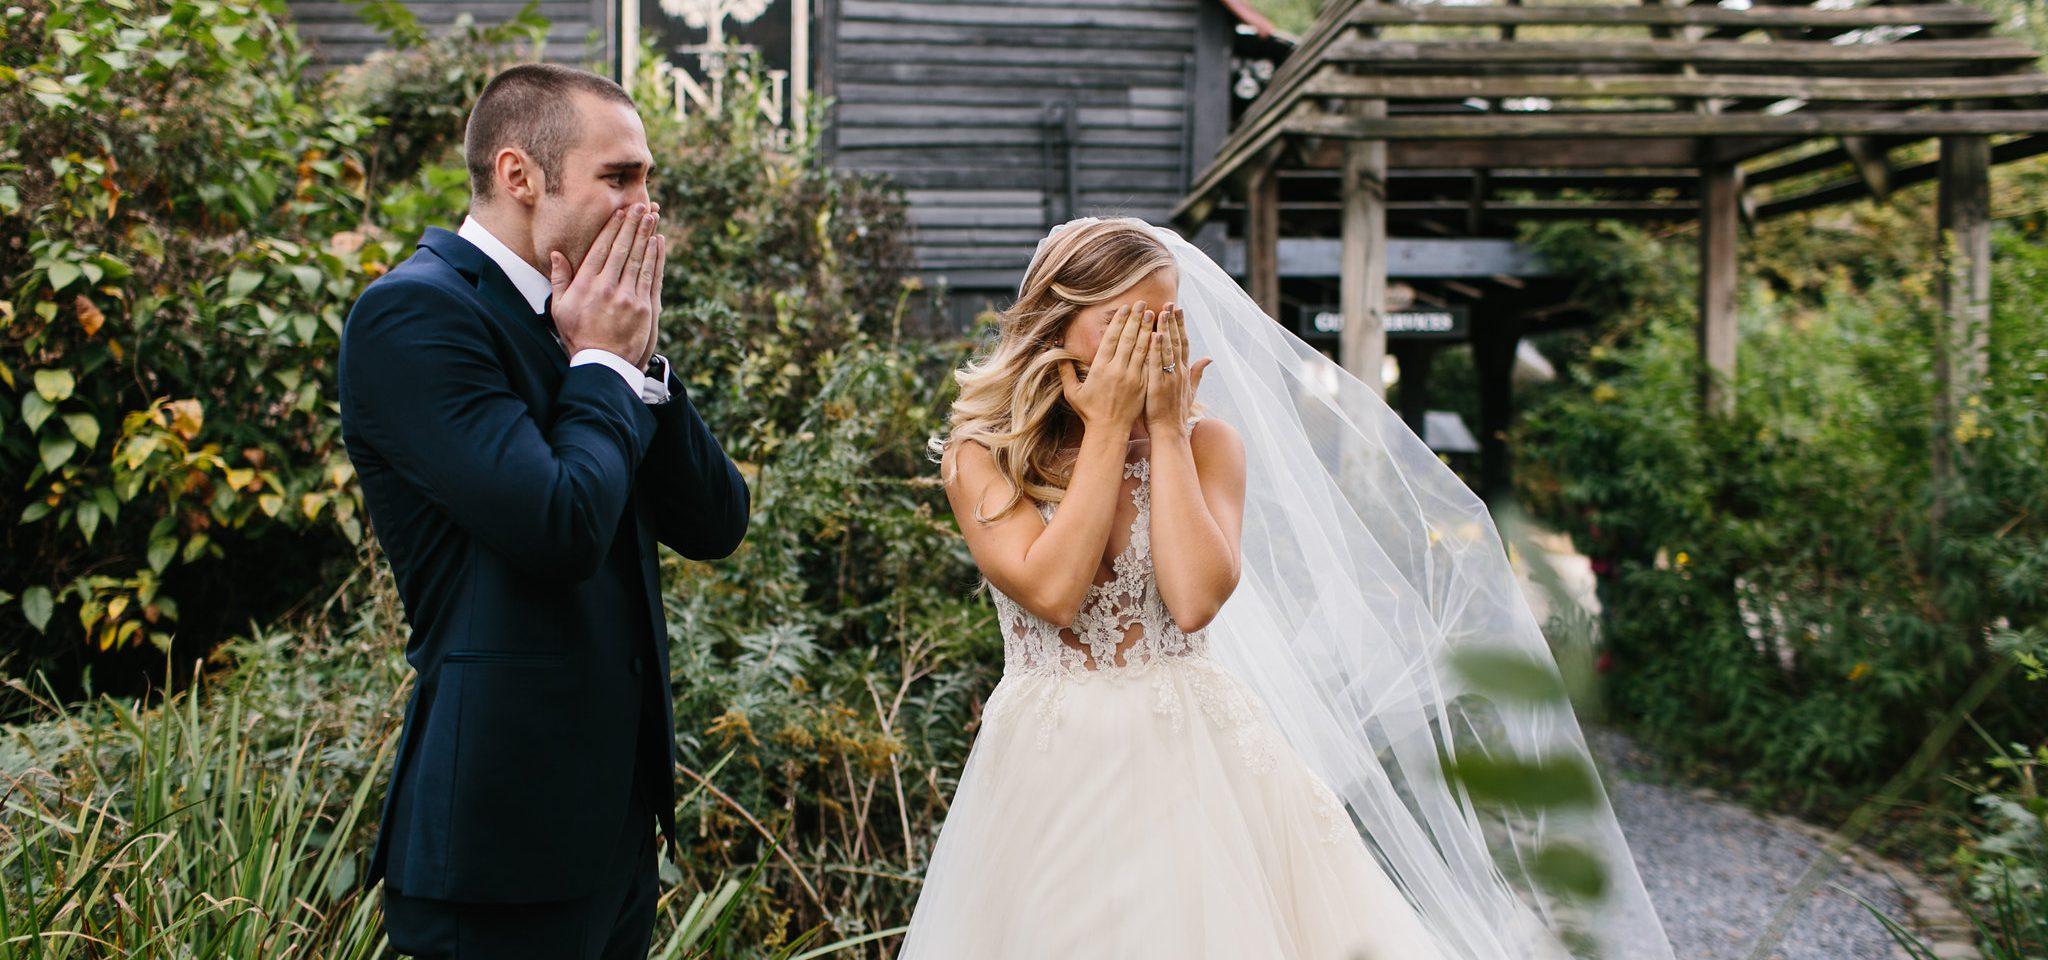 first look emotional bride and groom Serenbe